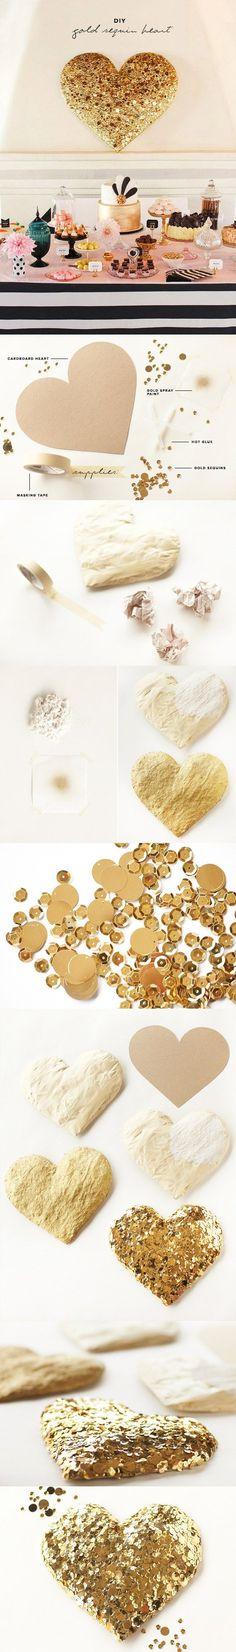 DIY Wedding Ideas – 5 Simple and Fun Glitter DIY Crafts | http://www.deerpearlflowers.com/diy-wedding-ideas-5-simple-fun-glitter-diy-crafts/